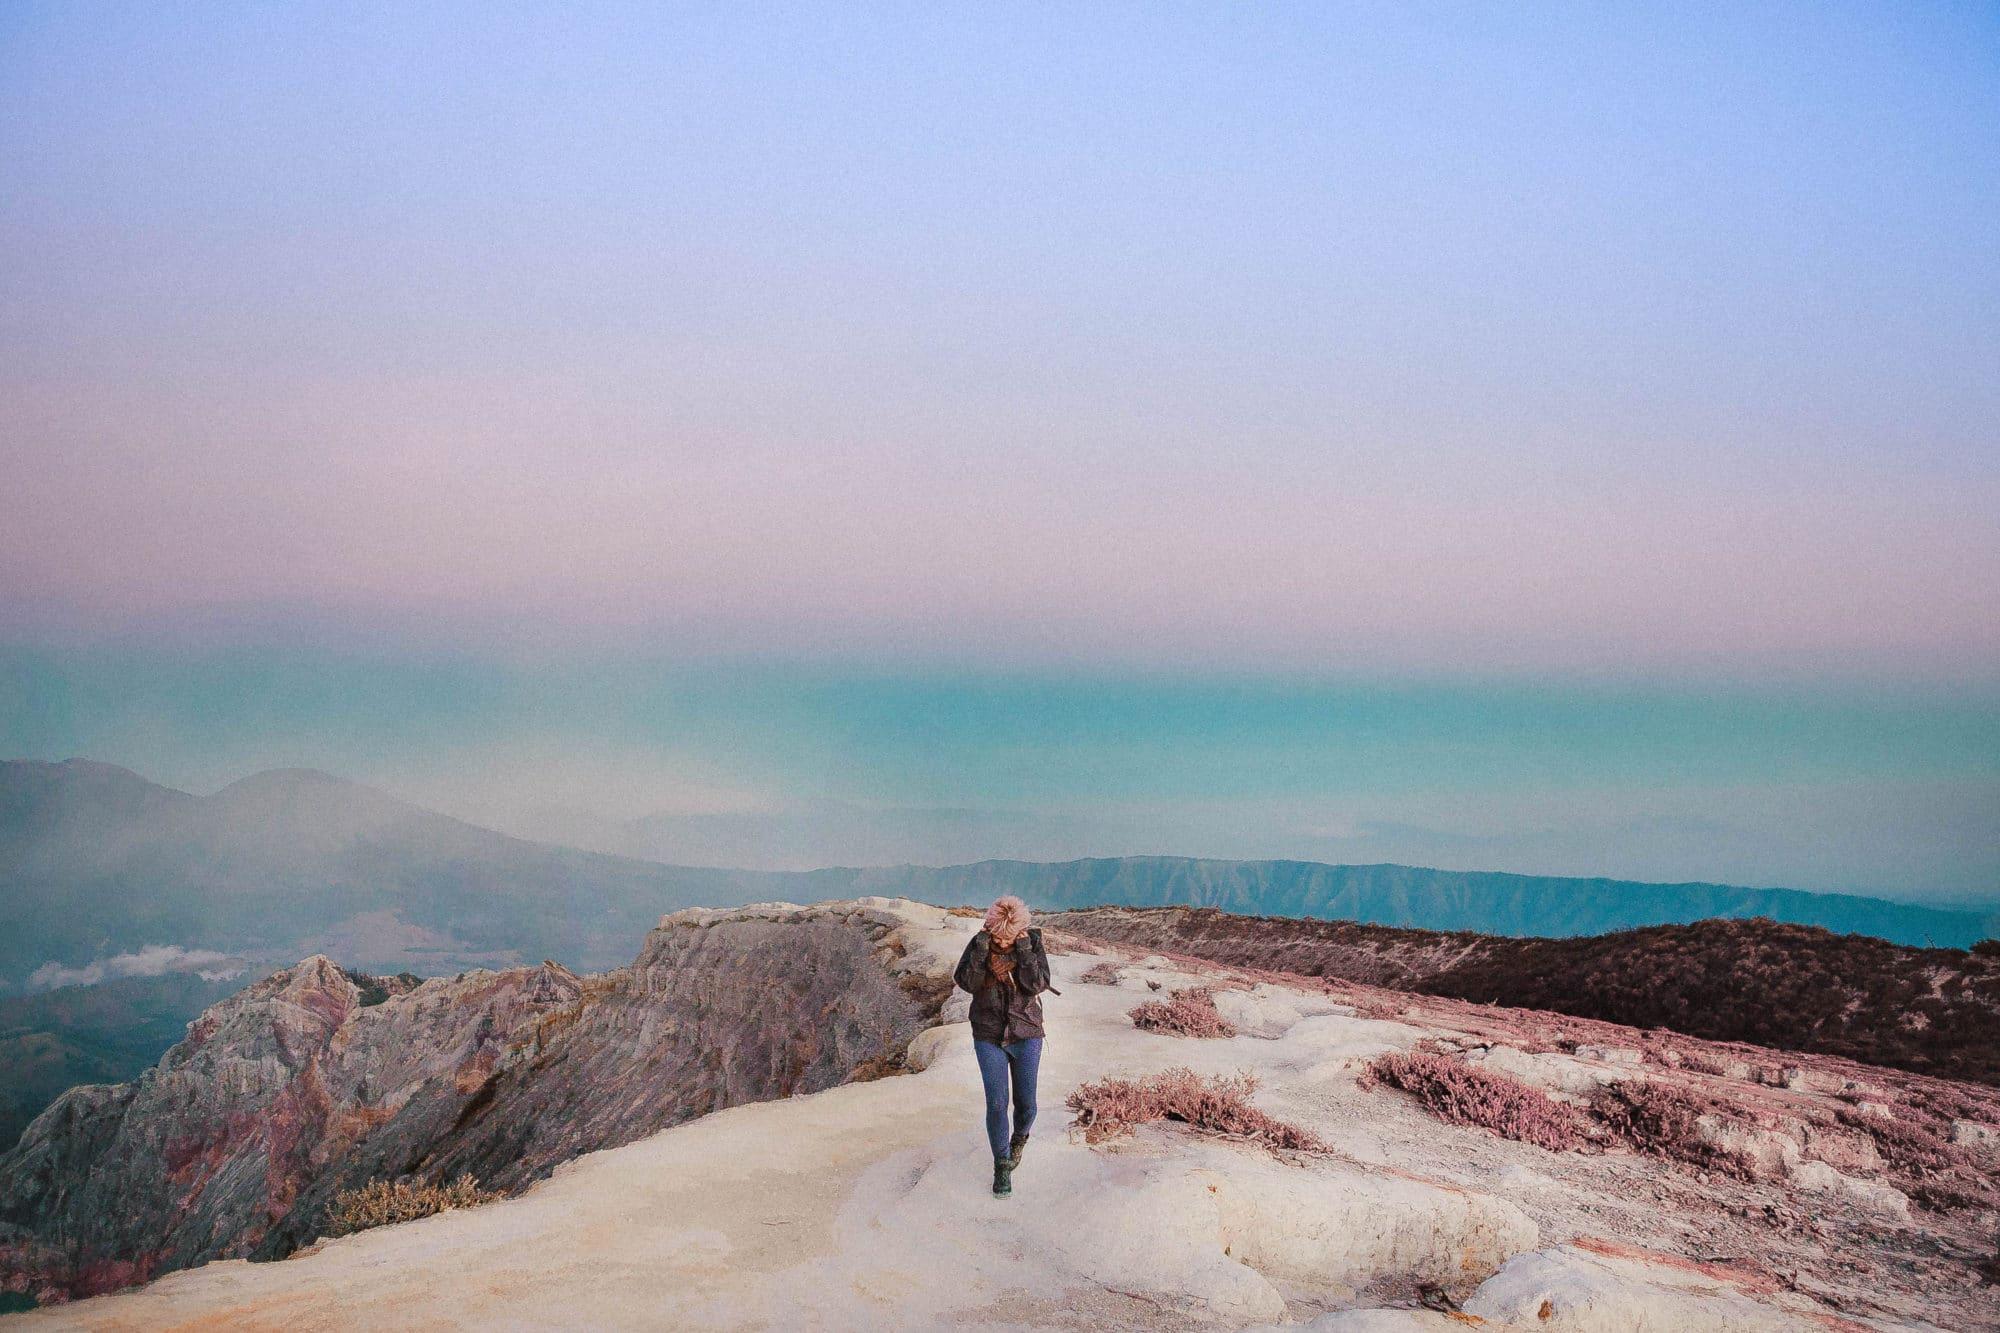 kawah ijen indonesia walking on the moon landscape beautiful nature sunrise tour pink sky pastels